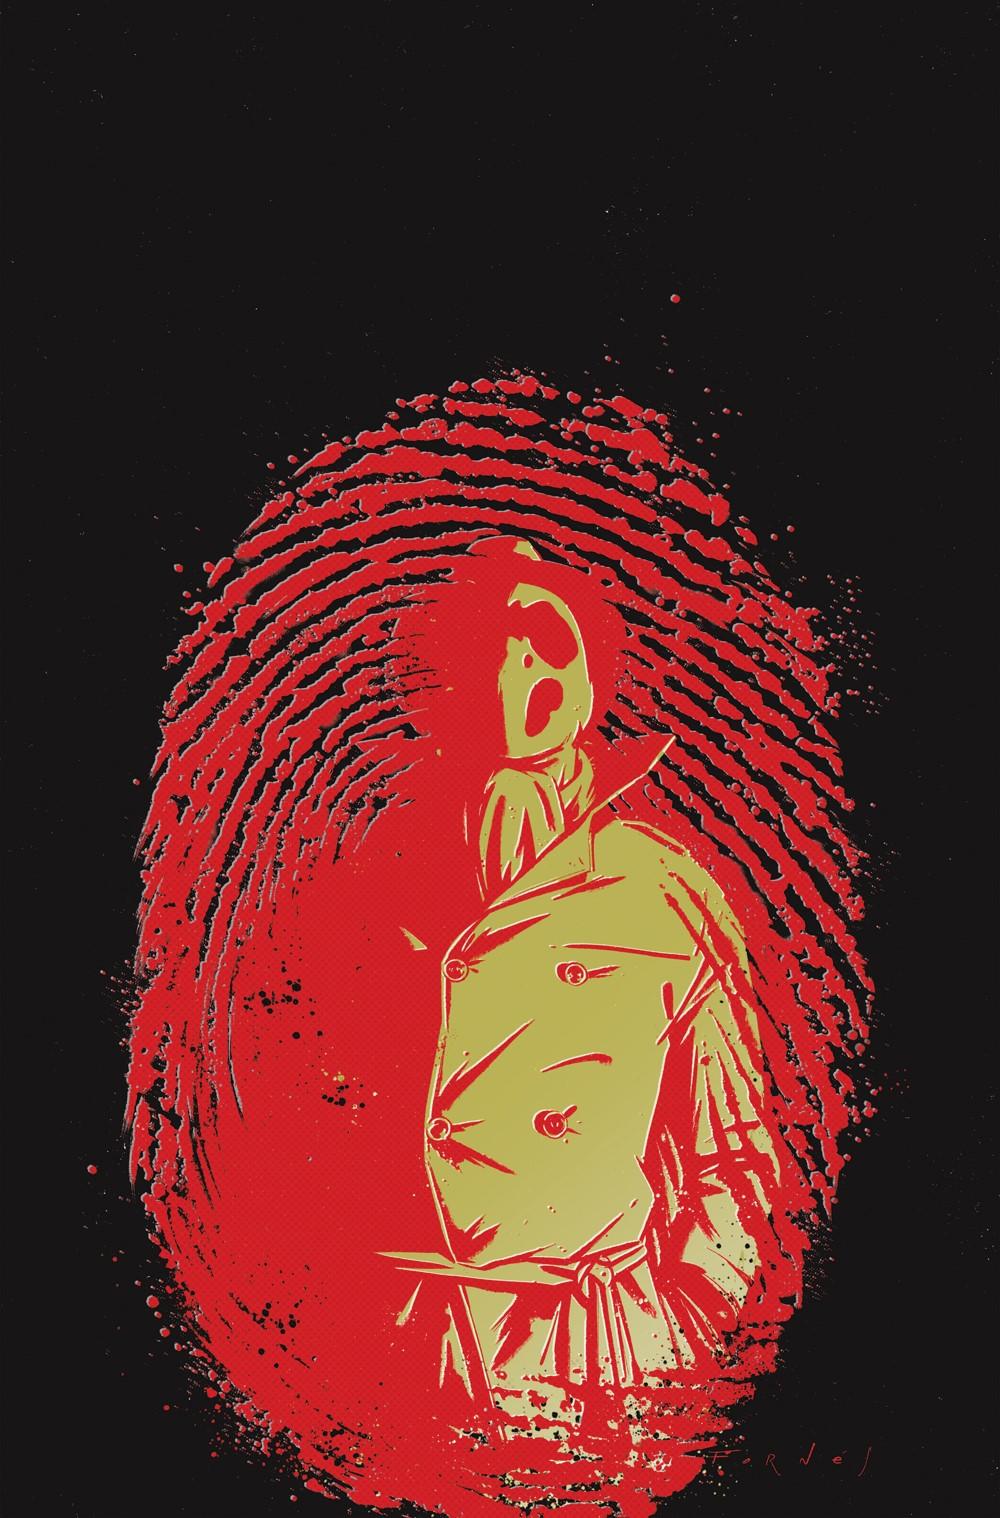 Rorschach-Hardcover DC Comics November 2021 Solicitations